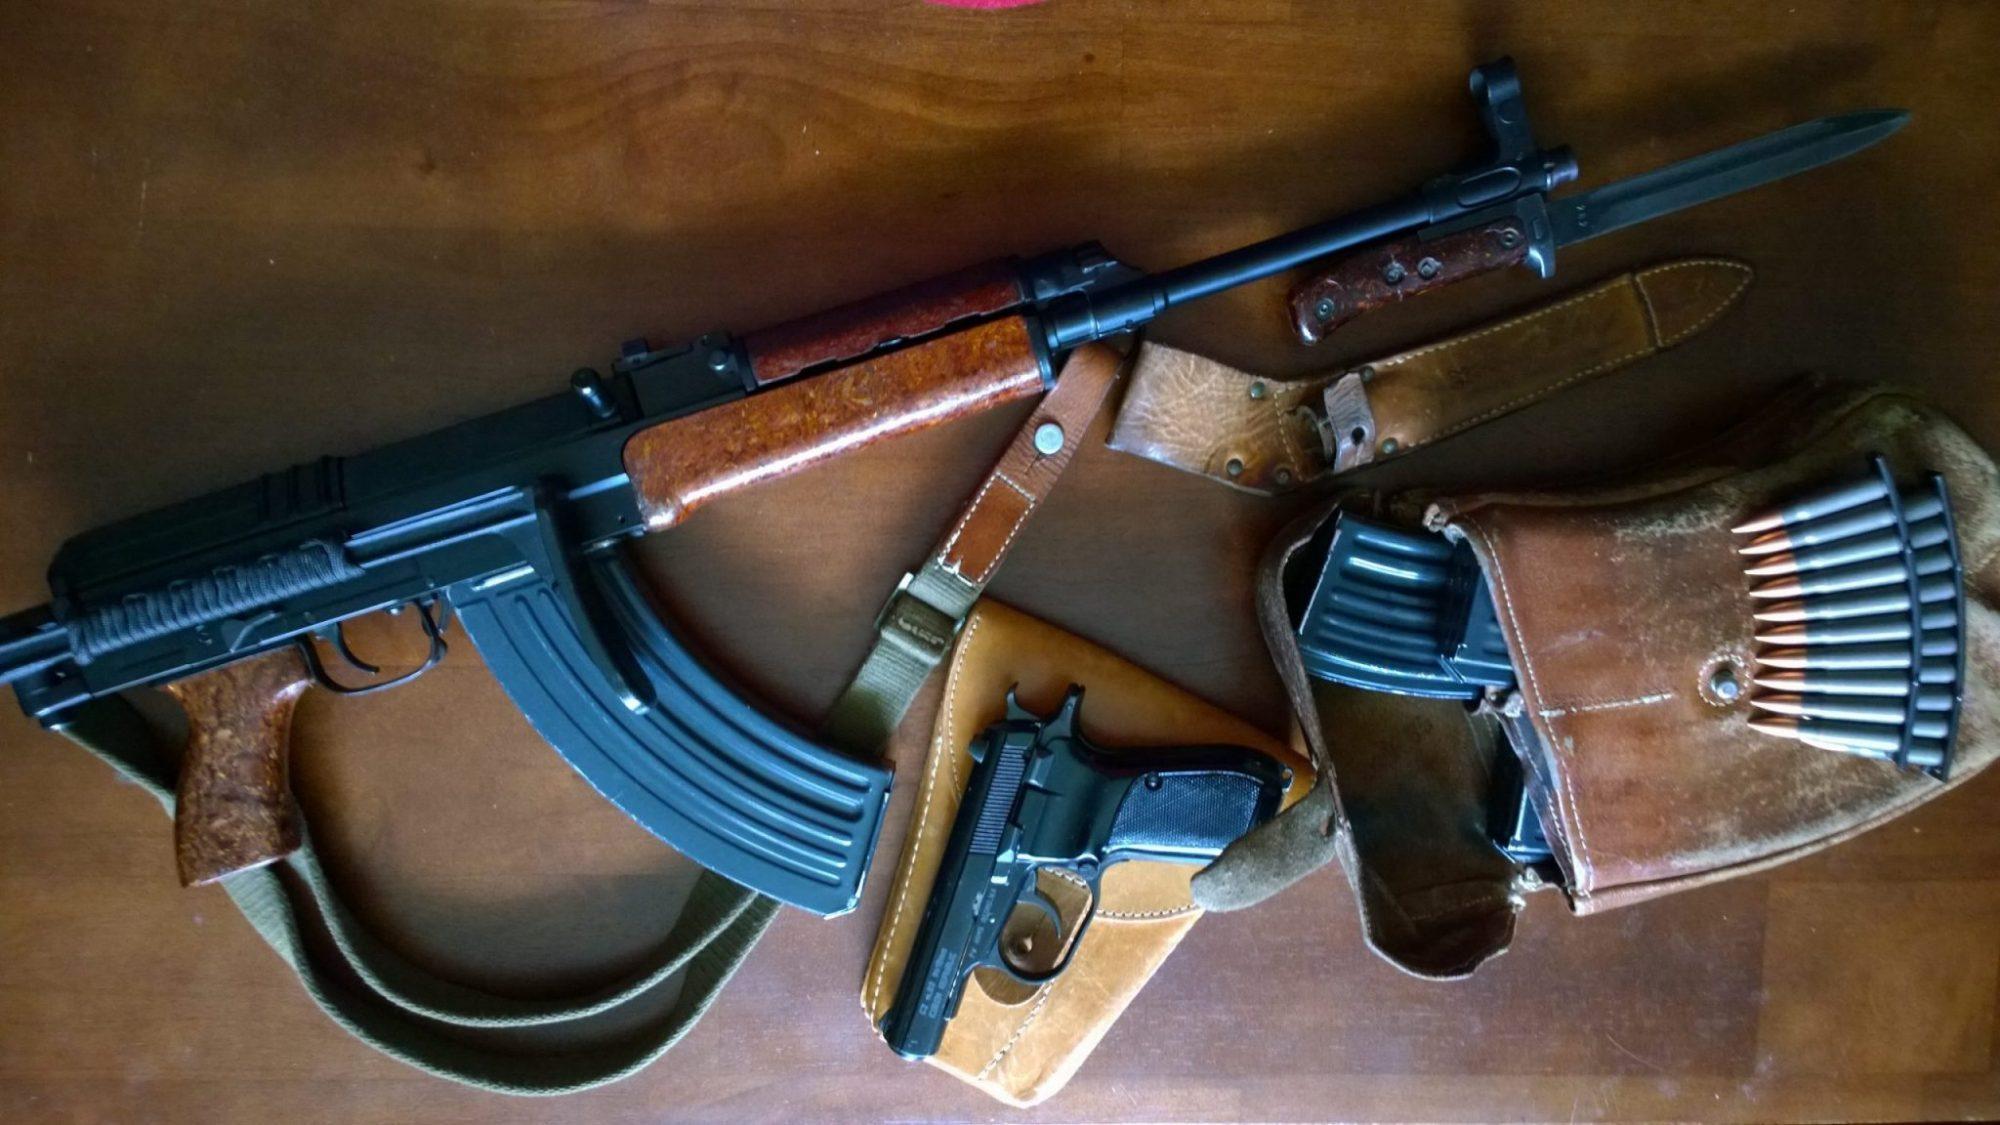 SAMOPAL vz. 58 assault rifle chambered in 7.62 x 39 mm Soviet